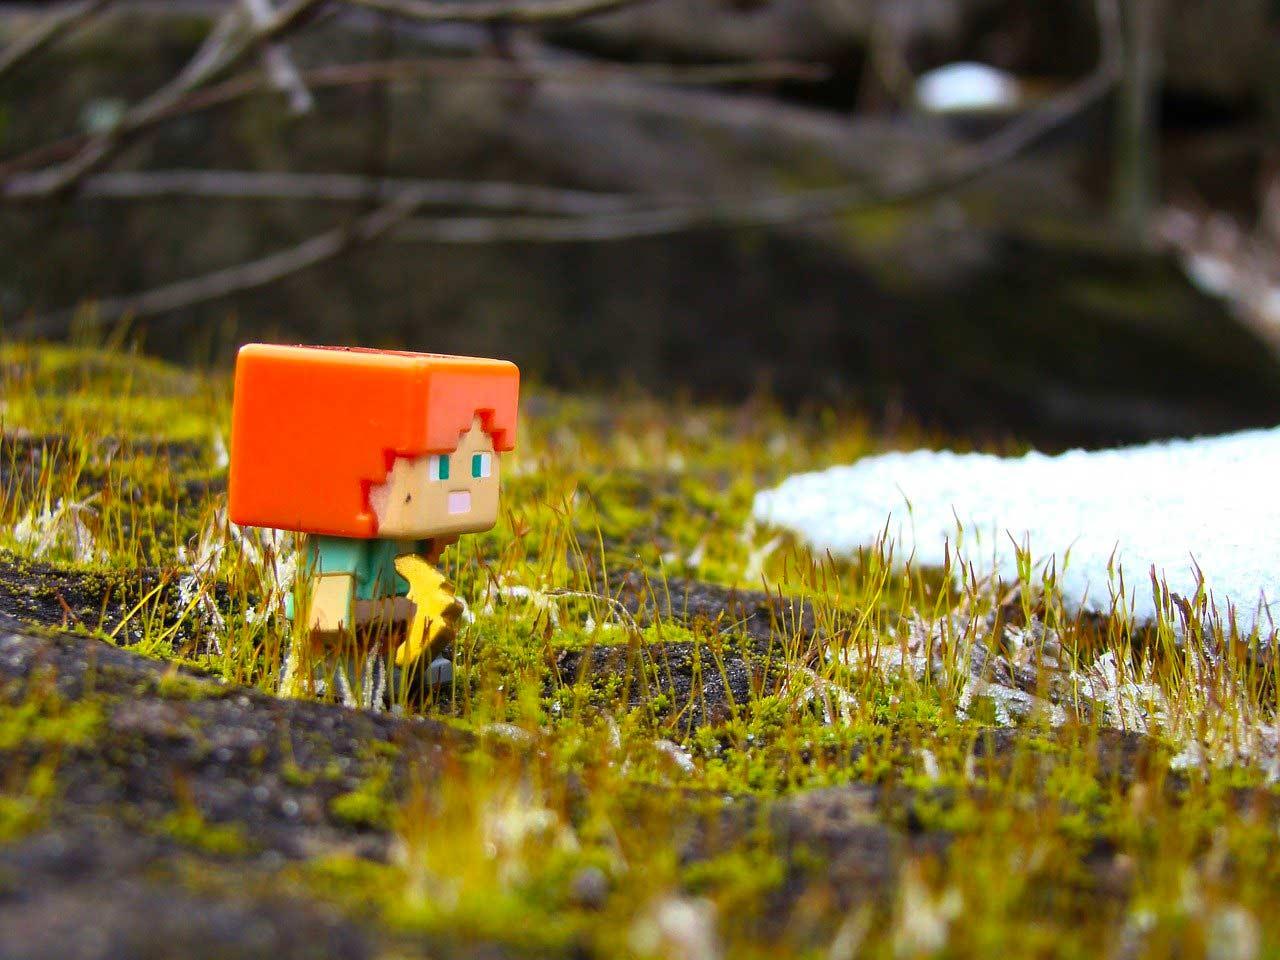 Une figurine de Minecraft dans la nature